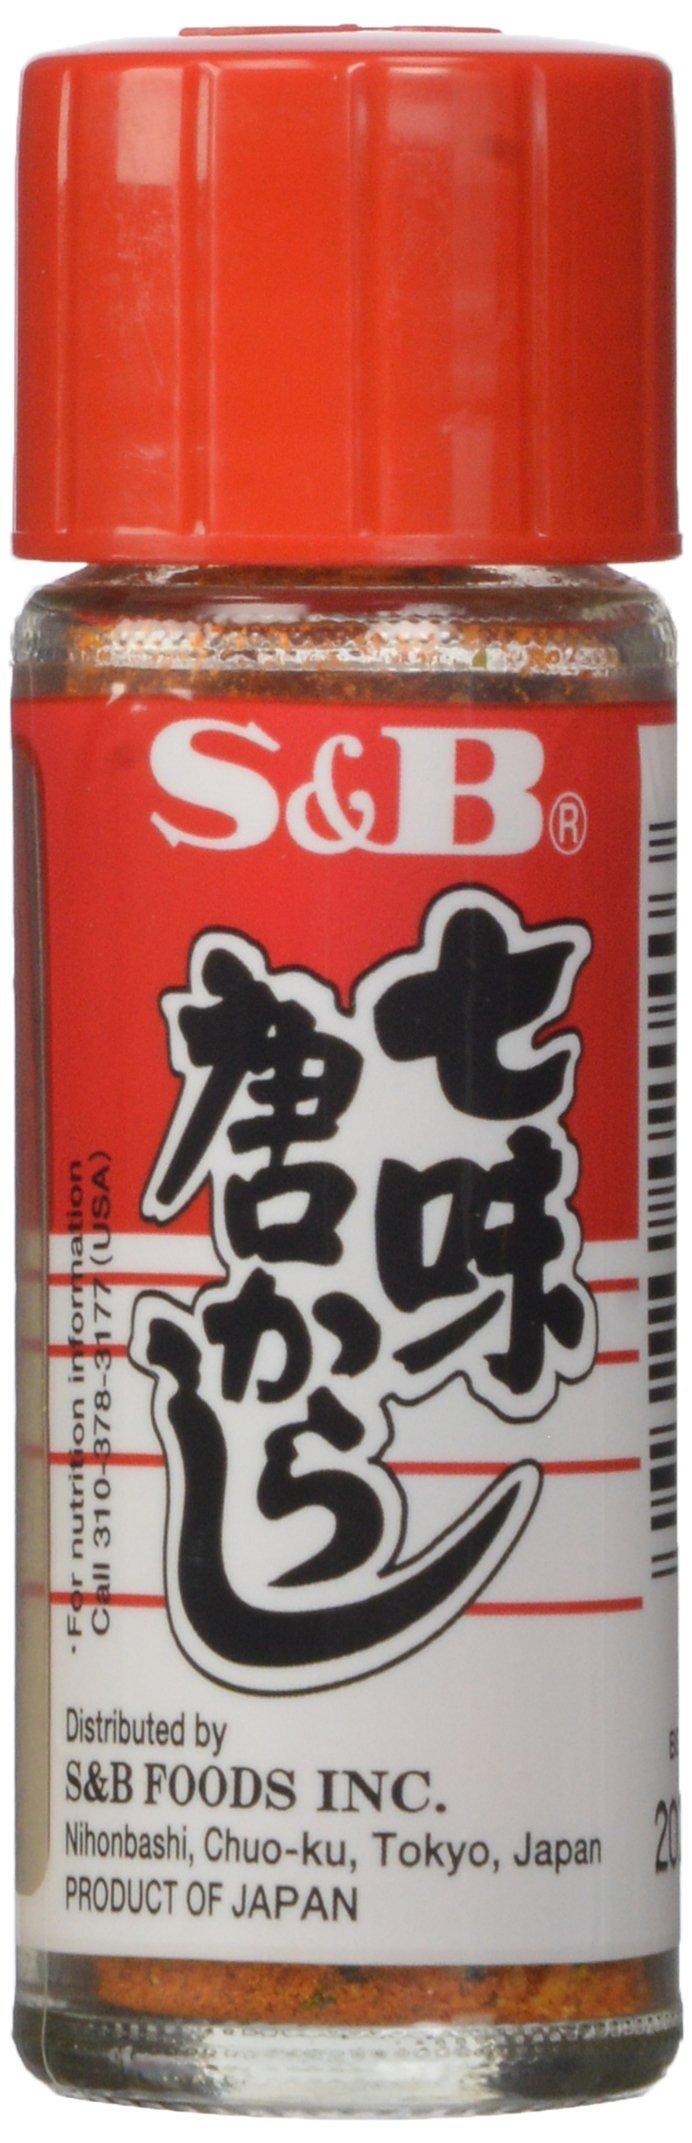 Spice Mixture Shichimi tougarashi SB 15g Japan